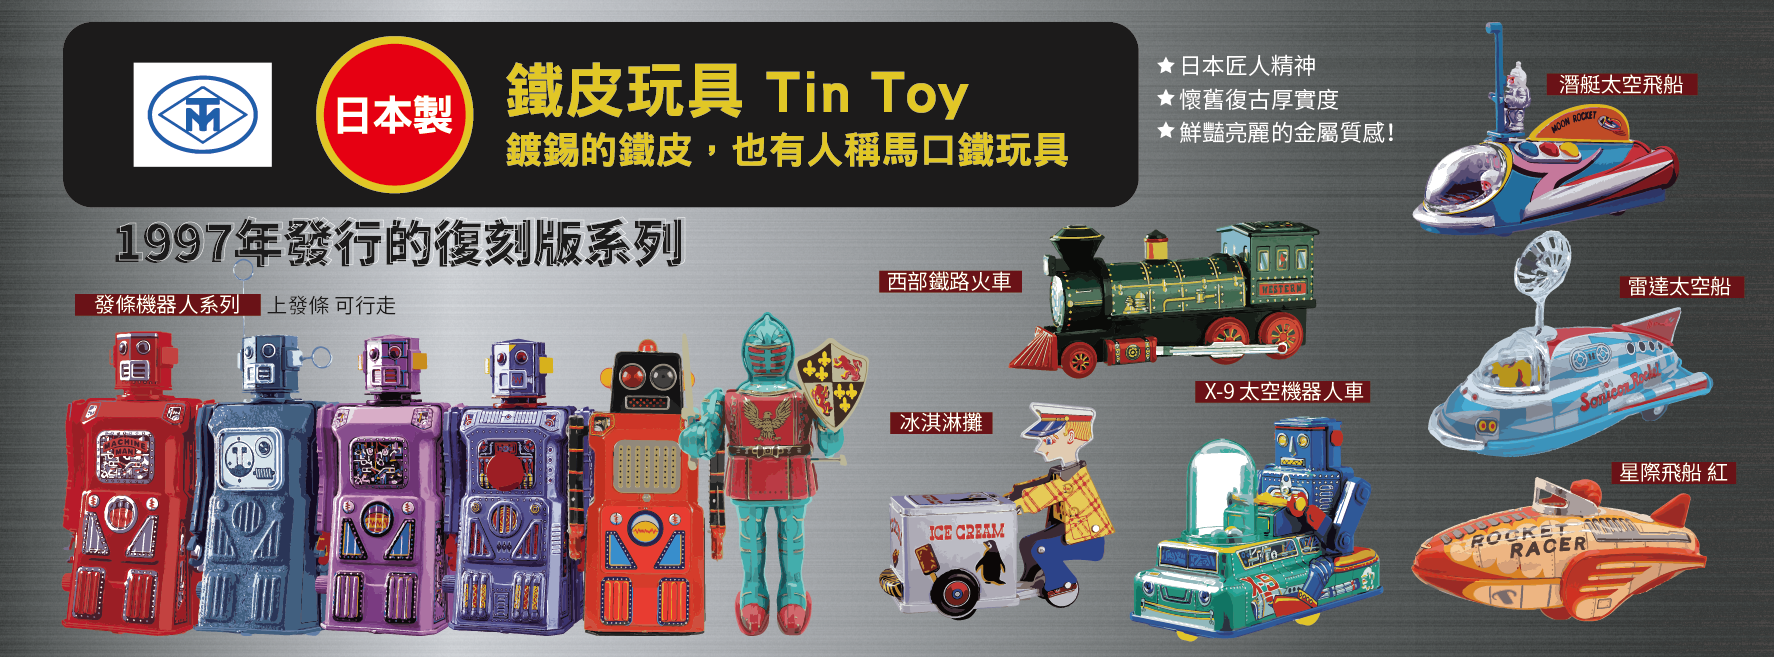 ●MASUDAYA 鐵皮玩具 - HobbyToy 哈玩具